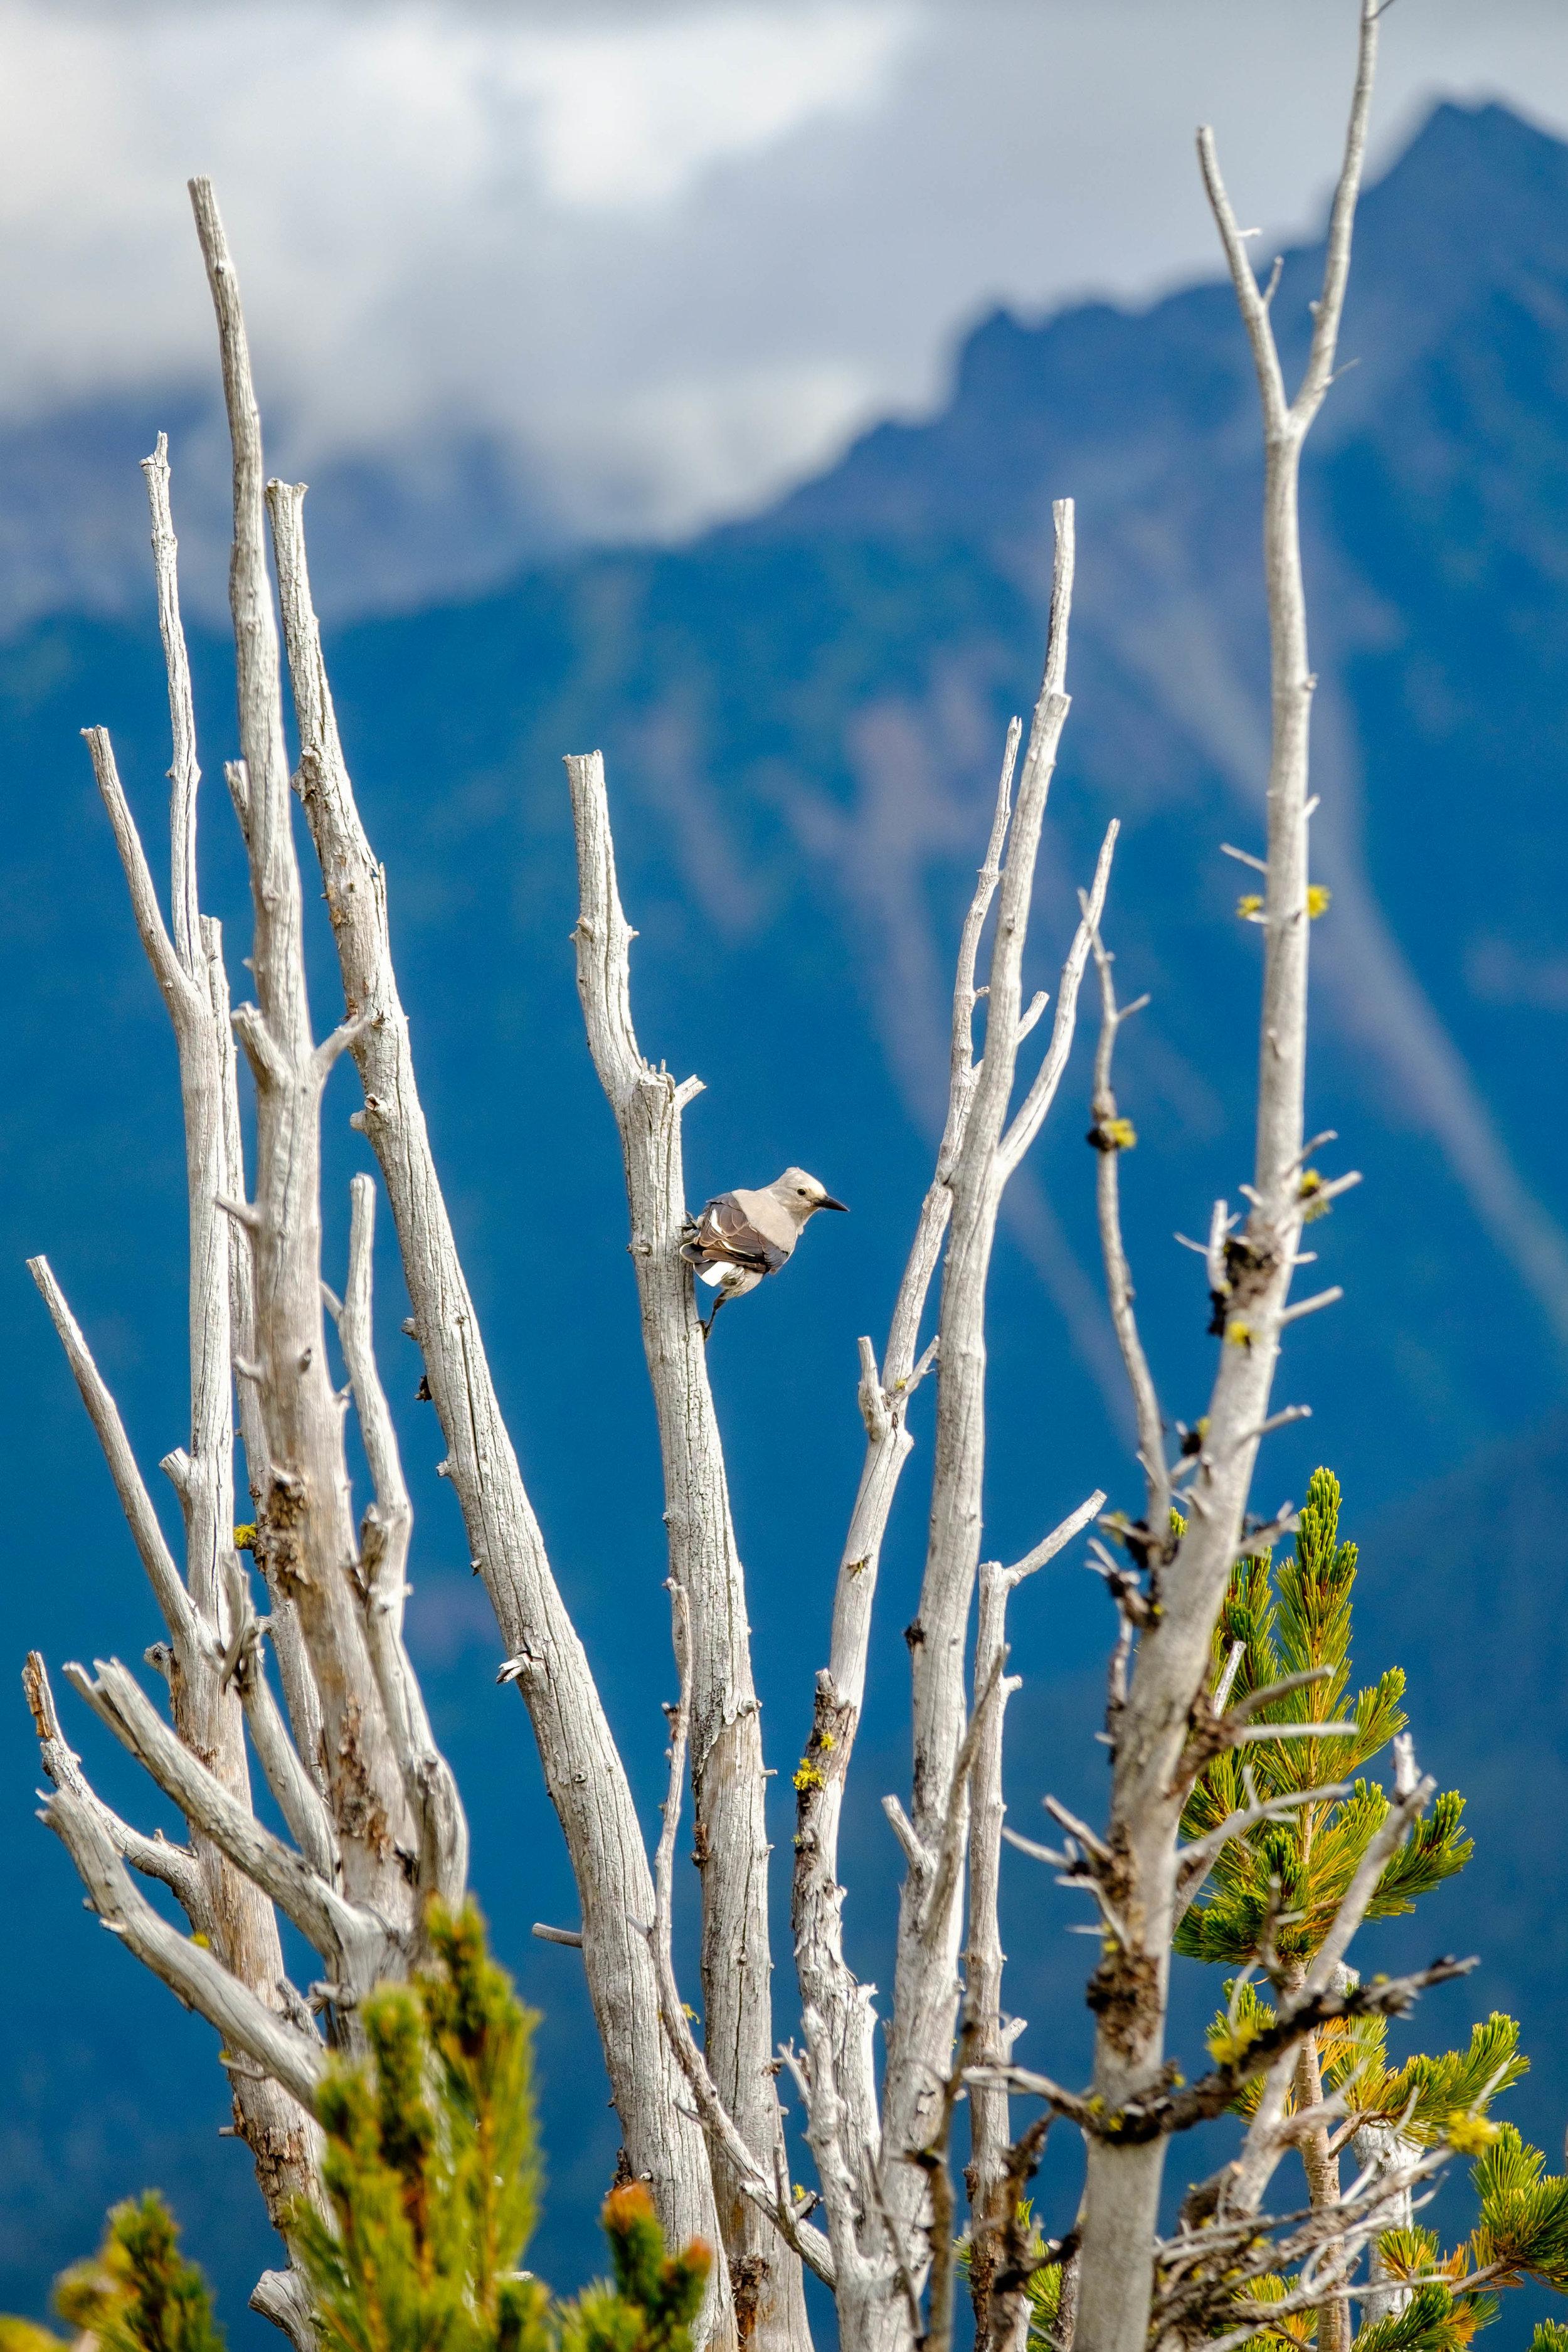 Mount Rainier National Park, Washington state, USA